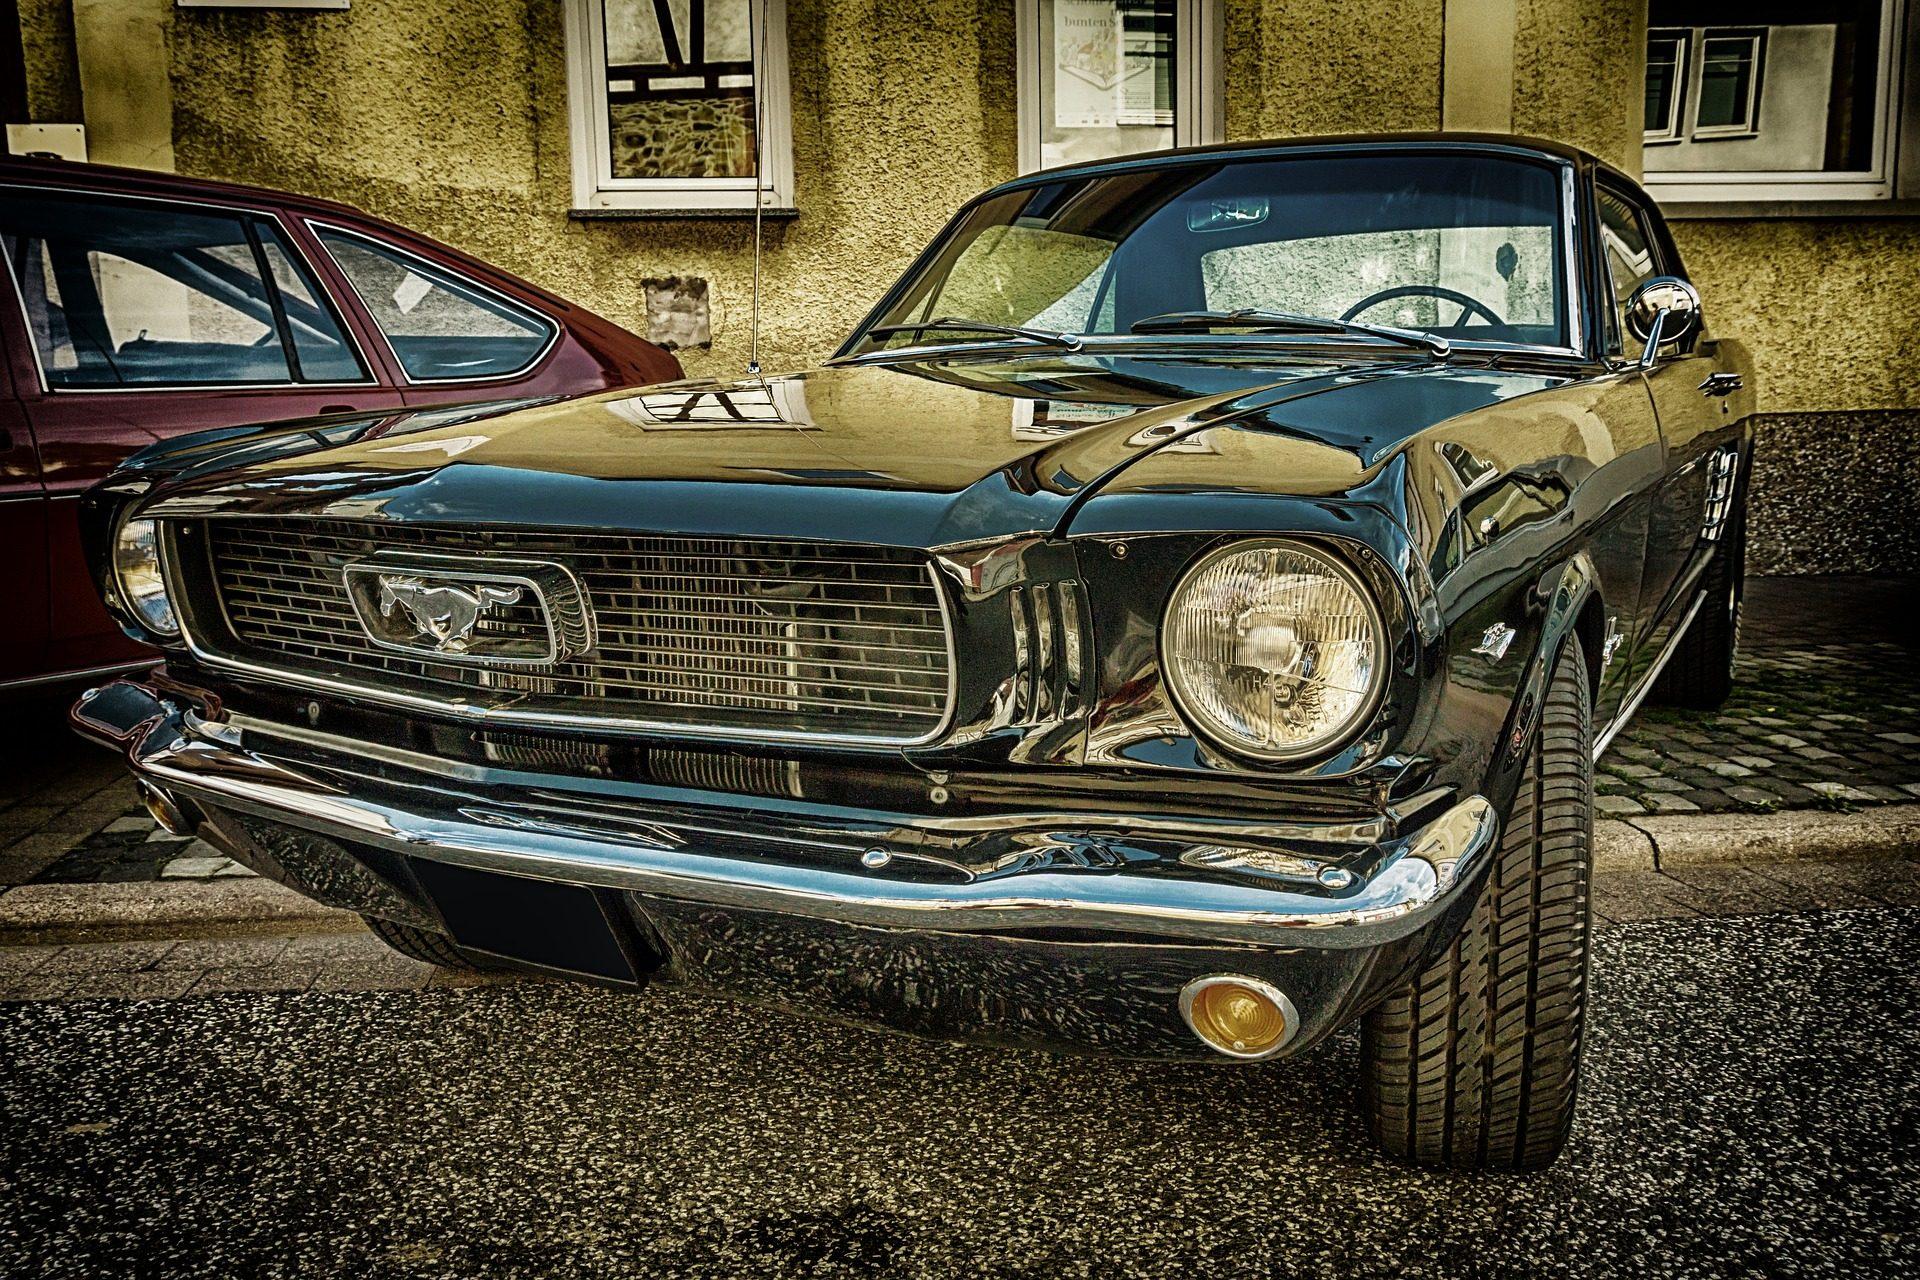 Auto, alt, Jahrgang, Klassiker, Helligkeit - Wallpaper HD - Prof.-falken.com